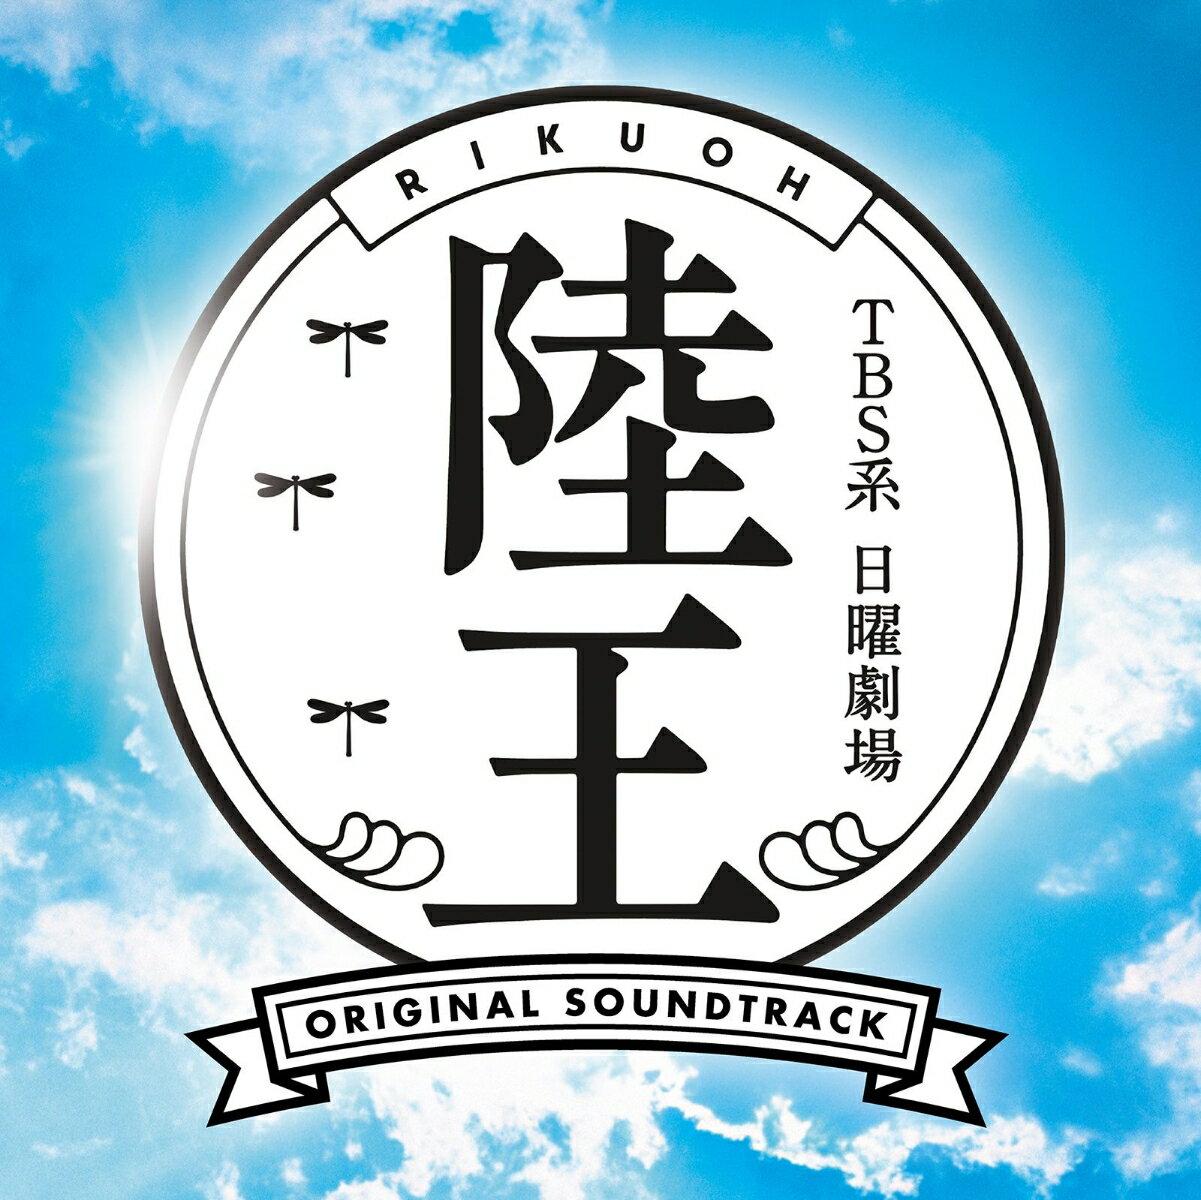 TBS系 日曜劇場 陸王 オリジナル・サウンドトラック [ (オリジナル・サウンドトラック) ]